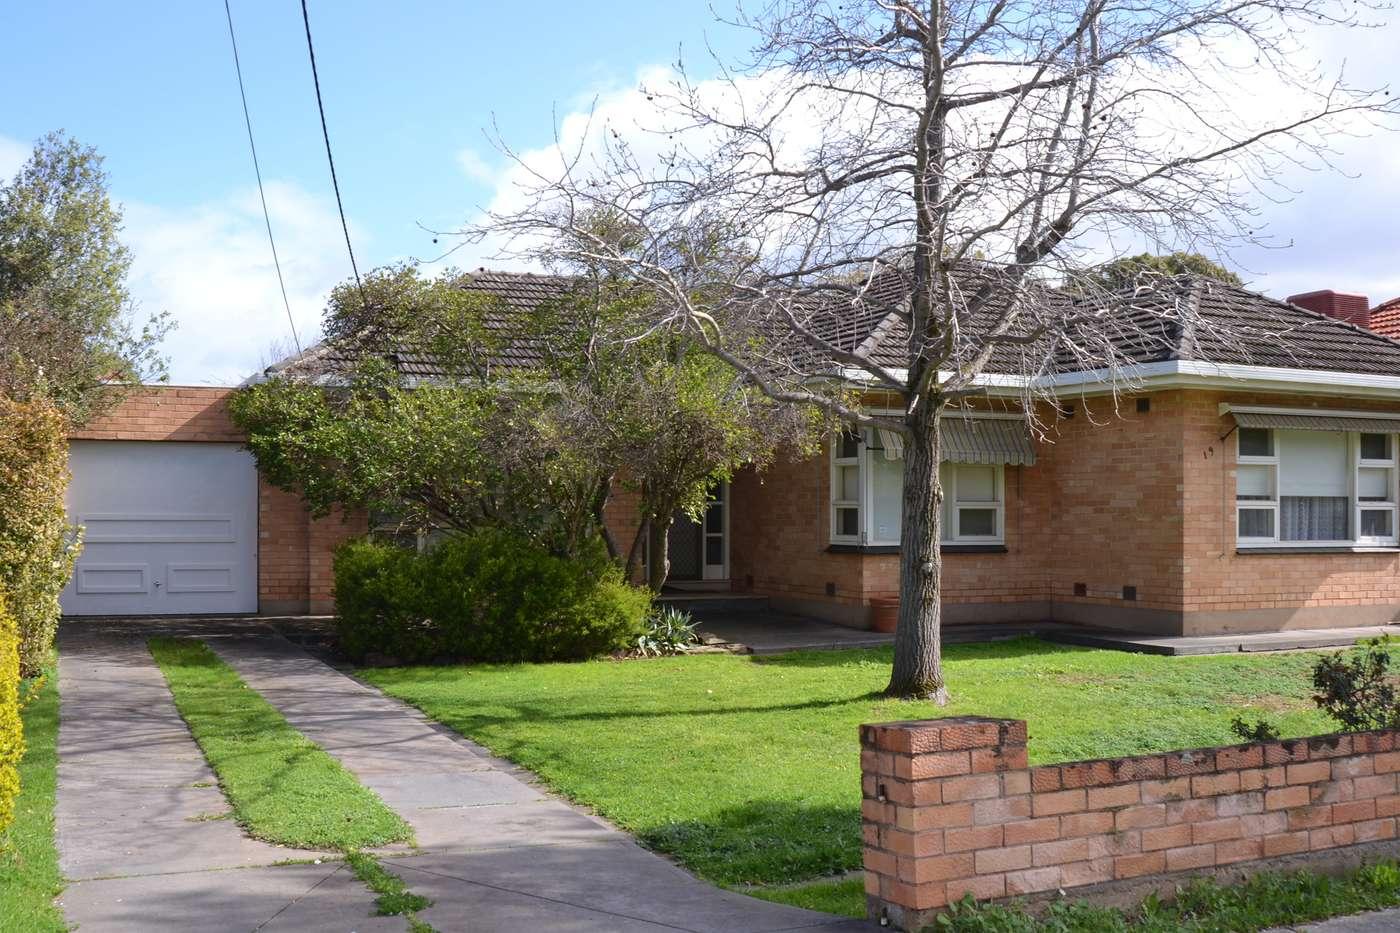 Main view of Homely house listing, 19 Osborn Terrace, Plympton, SA 5038